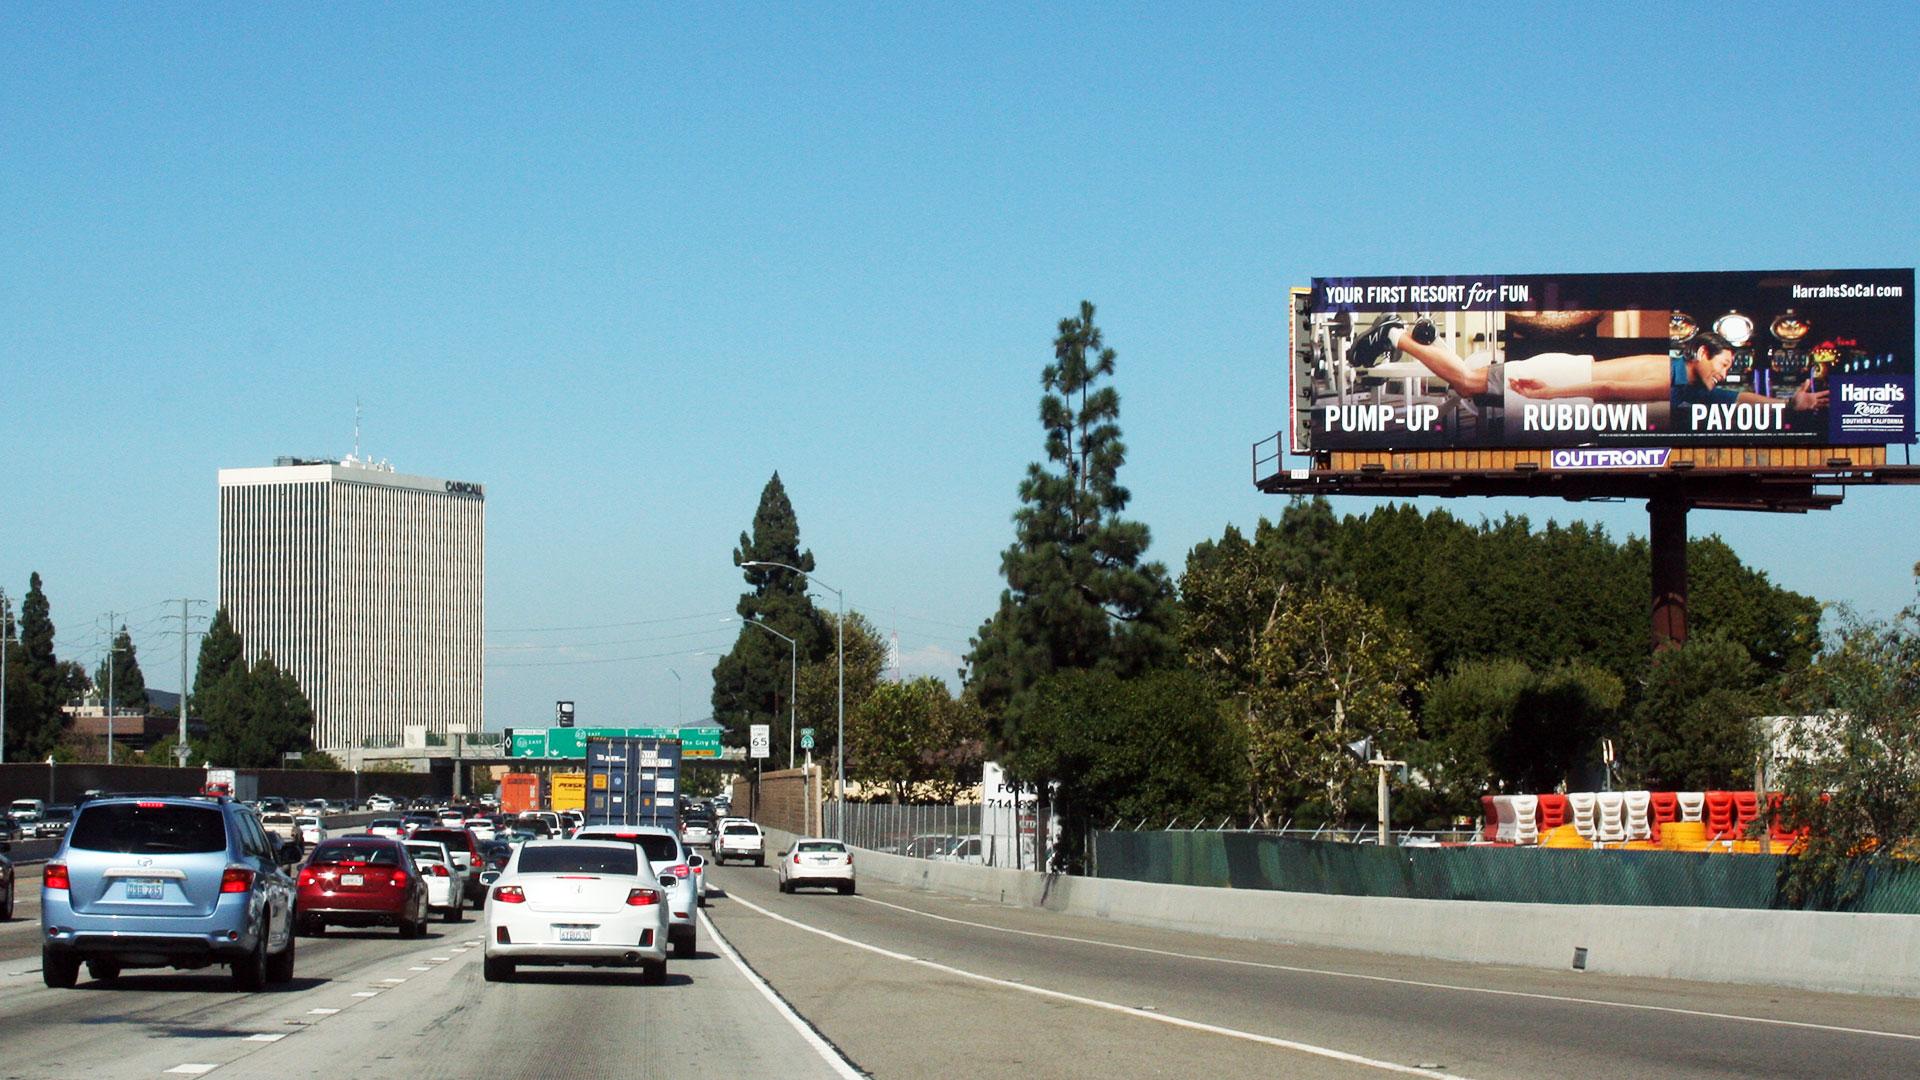 Bray Outdoor Ads Bray Outdoor Ads Bray Outdoor Ads Orange County 22 Freeway